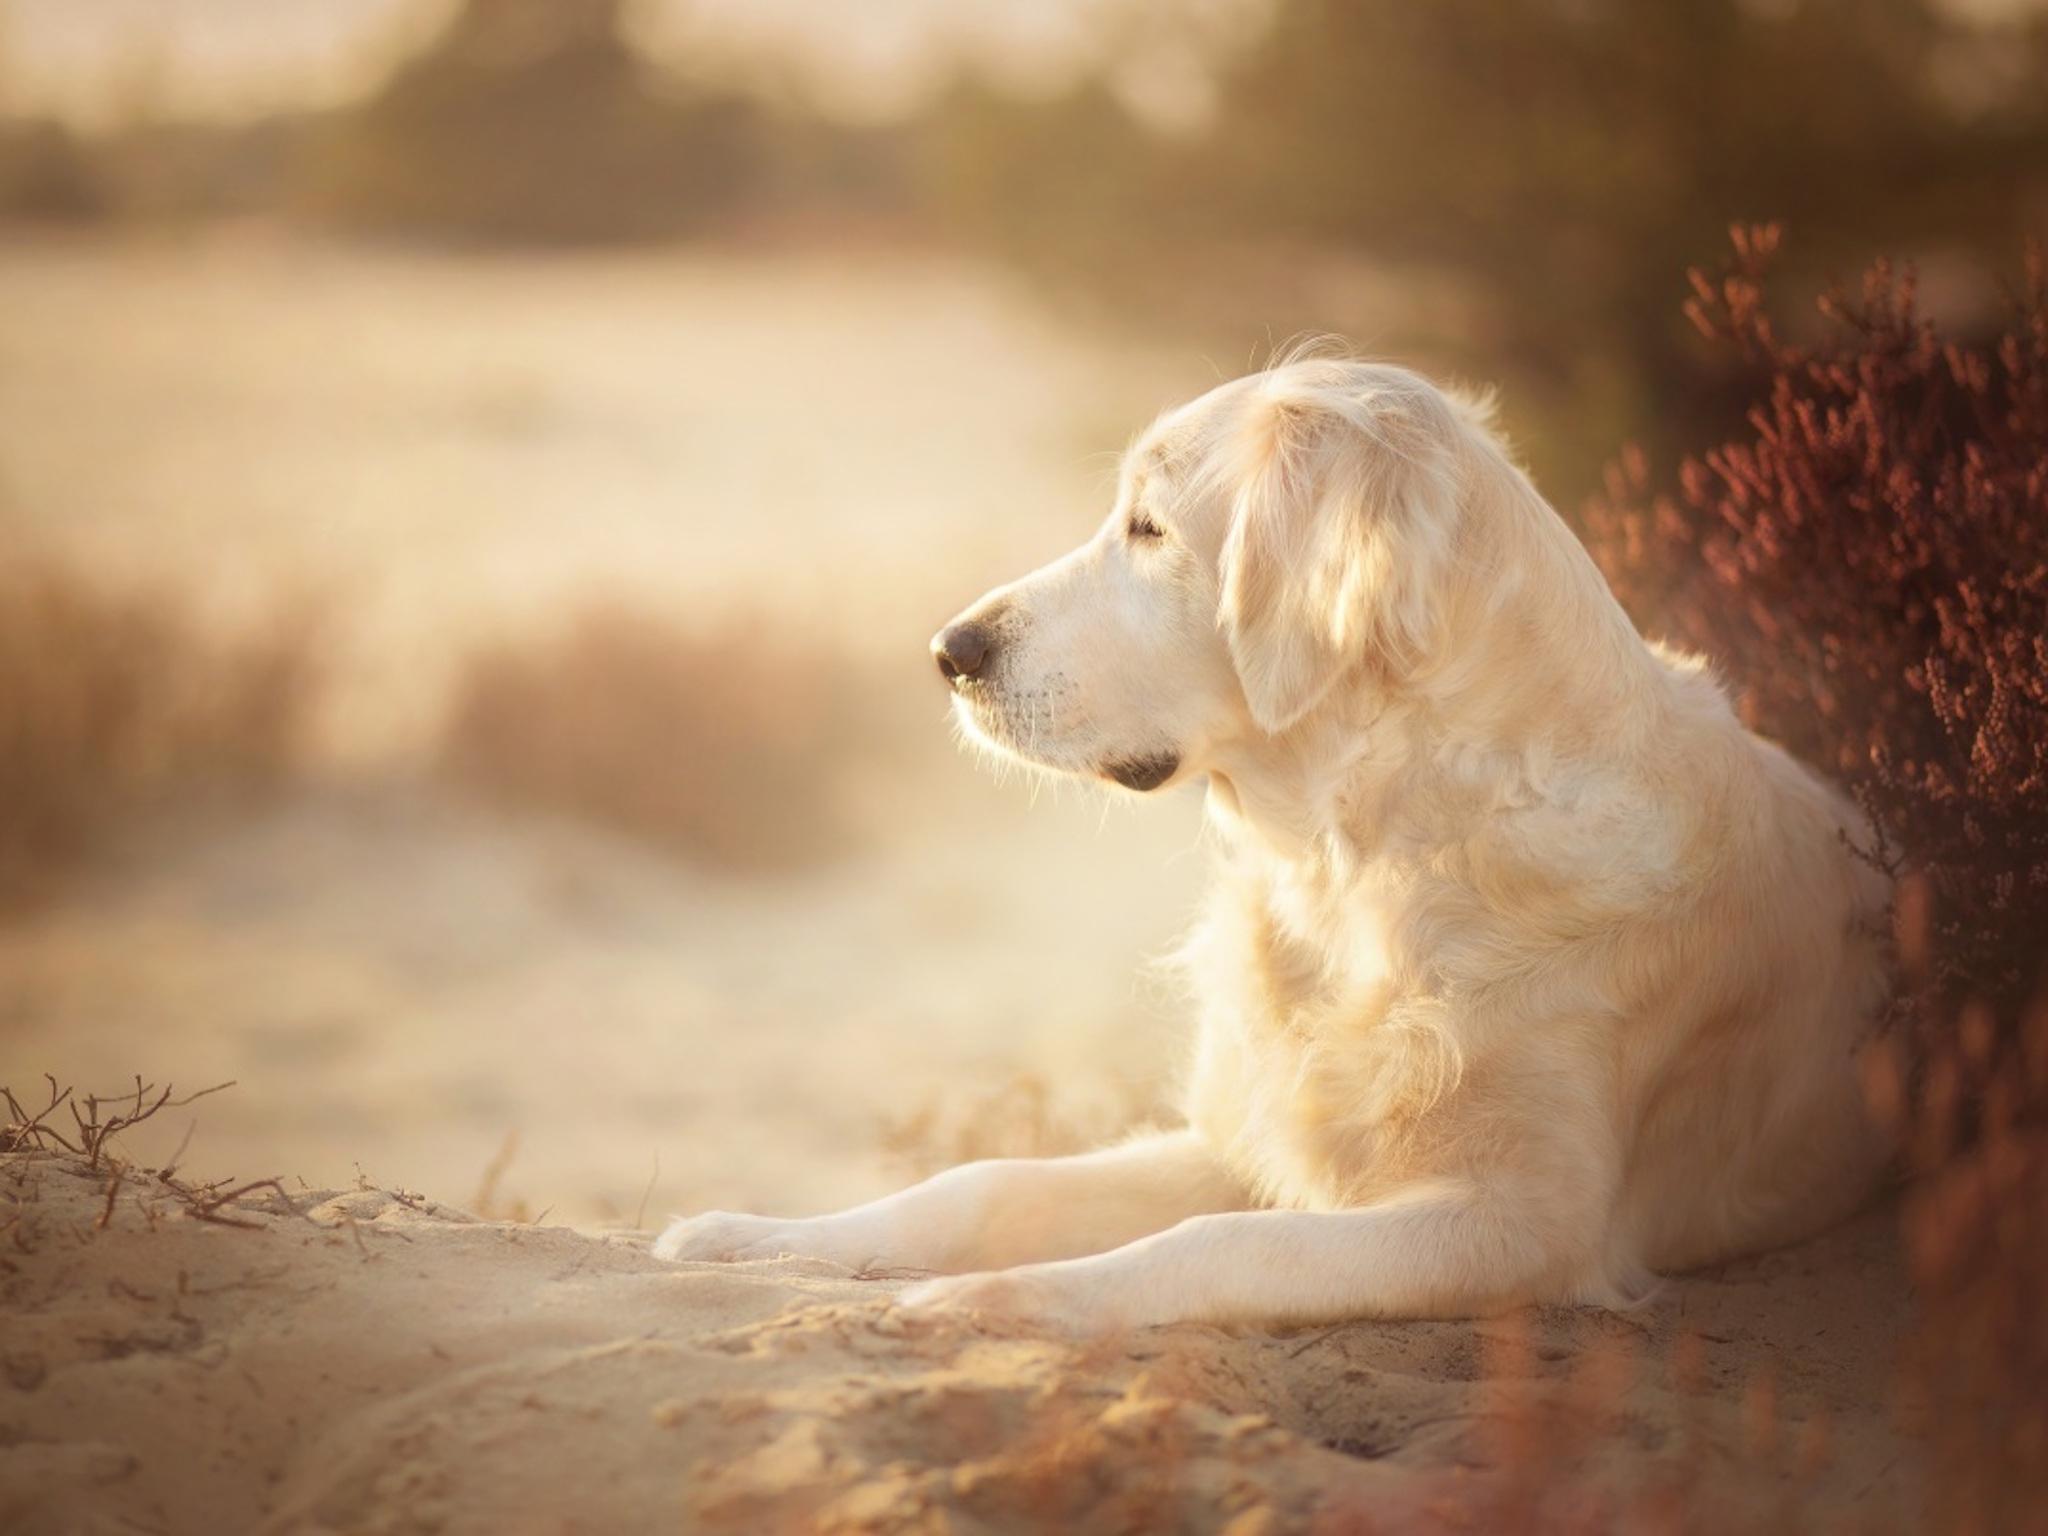 Golden Retriever Relaxing Wallpaper Free Hd Dog Images